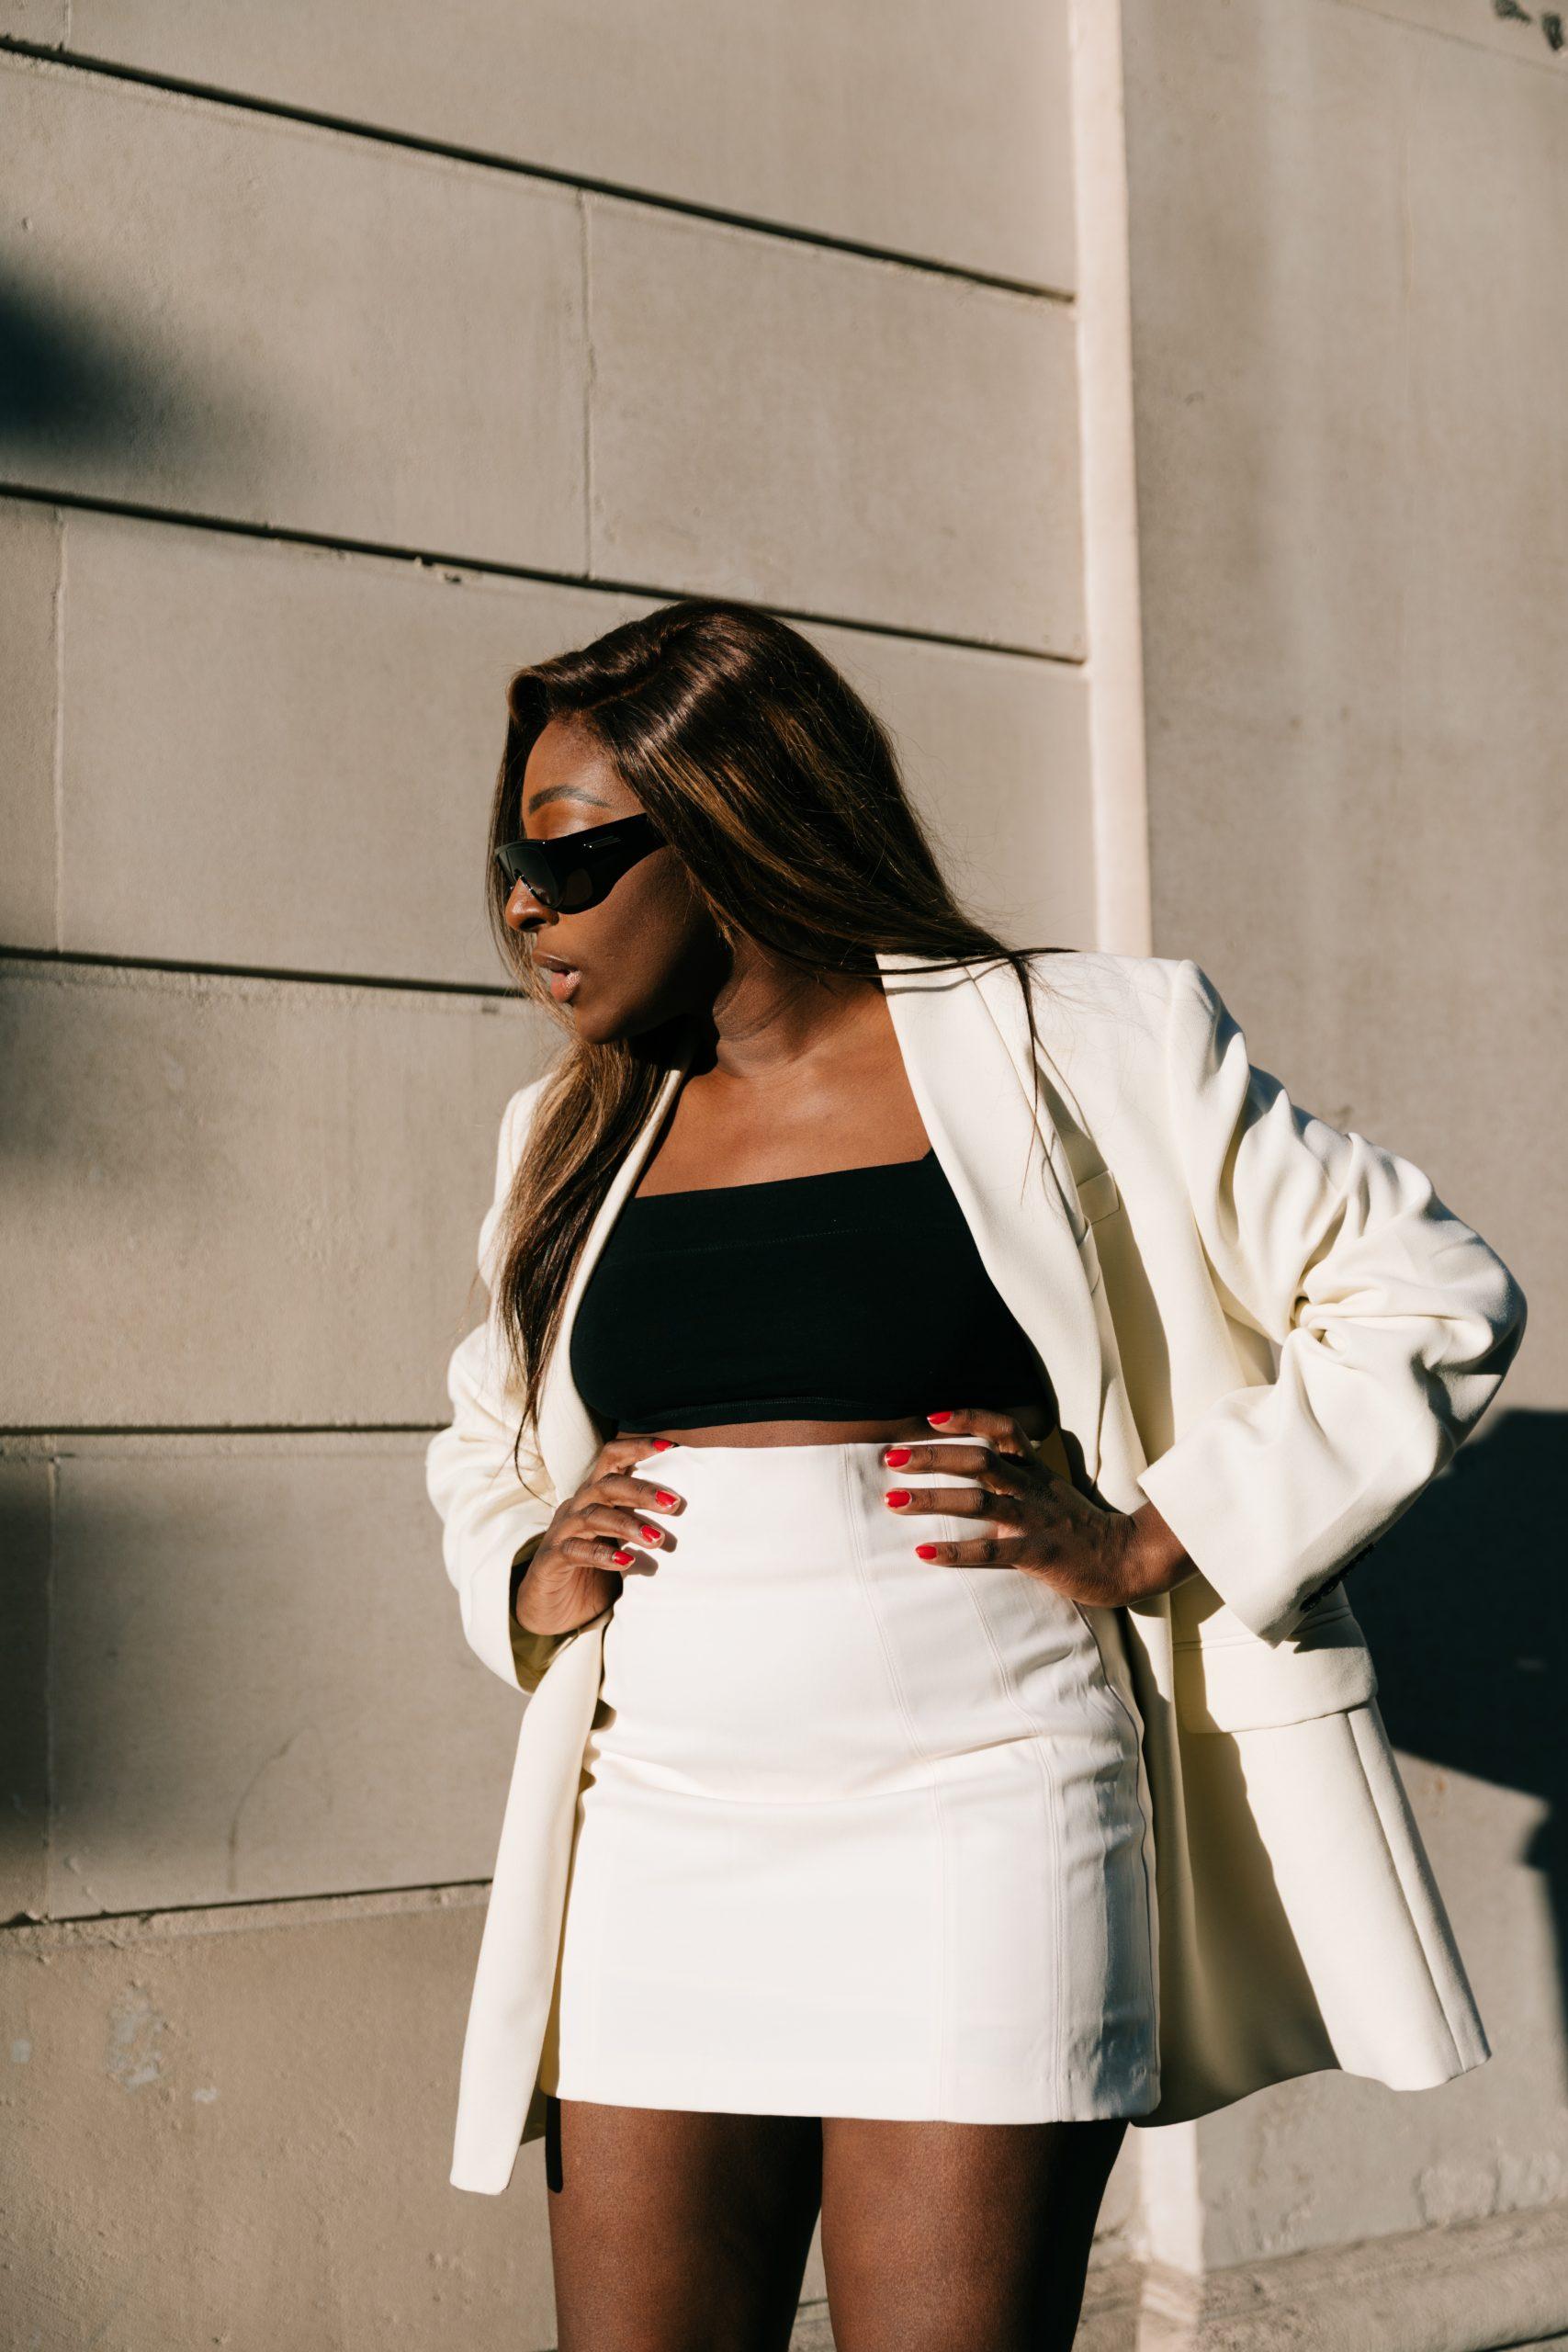 Oversized Blazers & Autumn Mini Skirts - Zara ecru blazer and strappy heels - Bottega Veneta Sunglasses - close up - Tasha Antwi